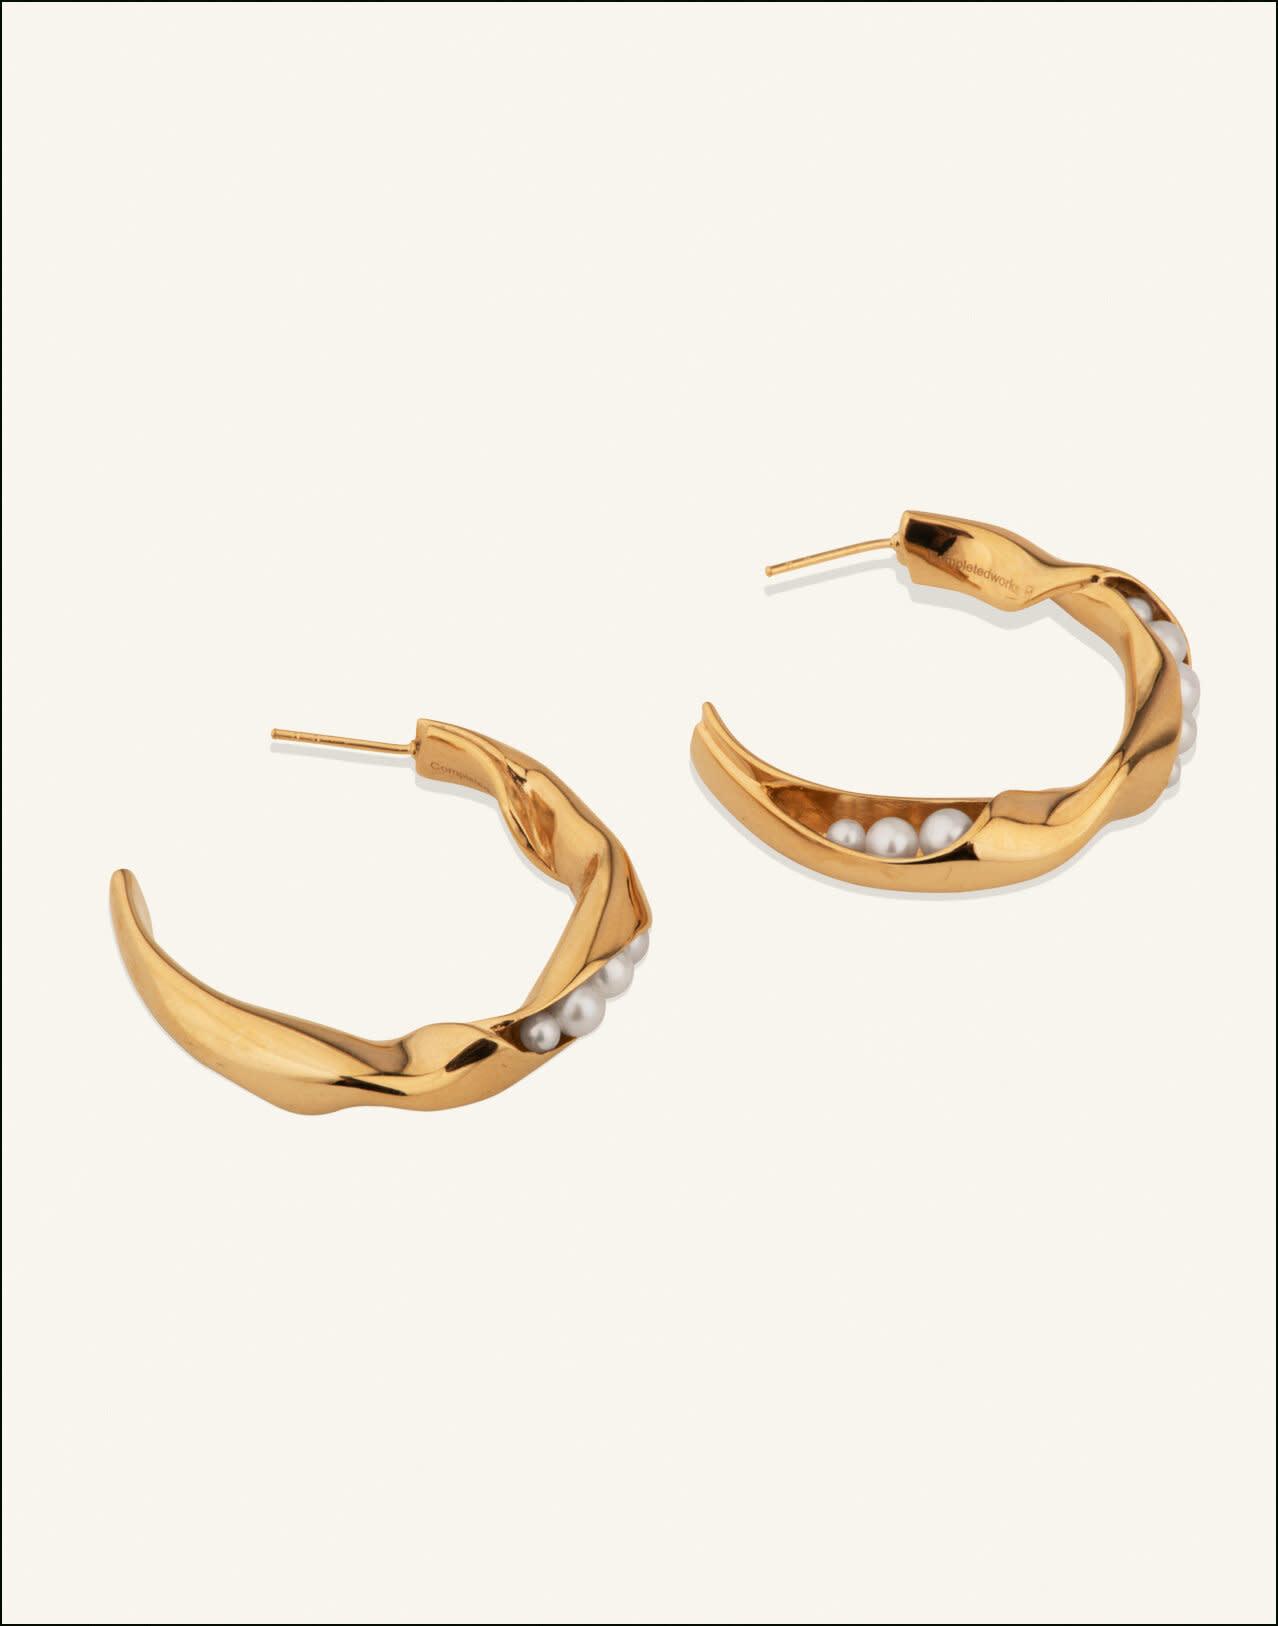 Completed Works Good Neighbours Gold Vermeil and Pearl Hoop Earrings